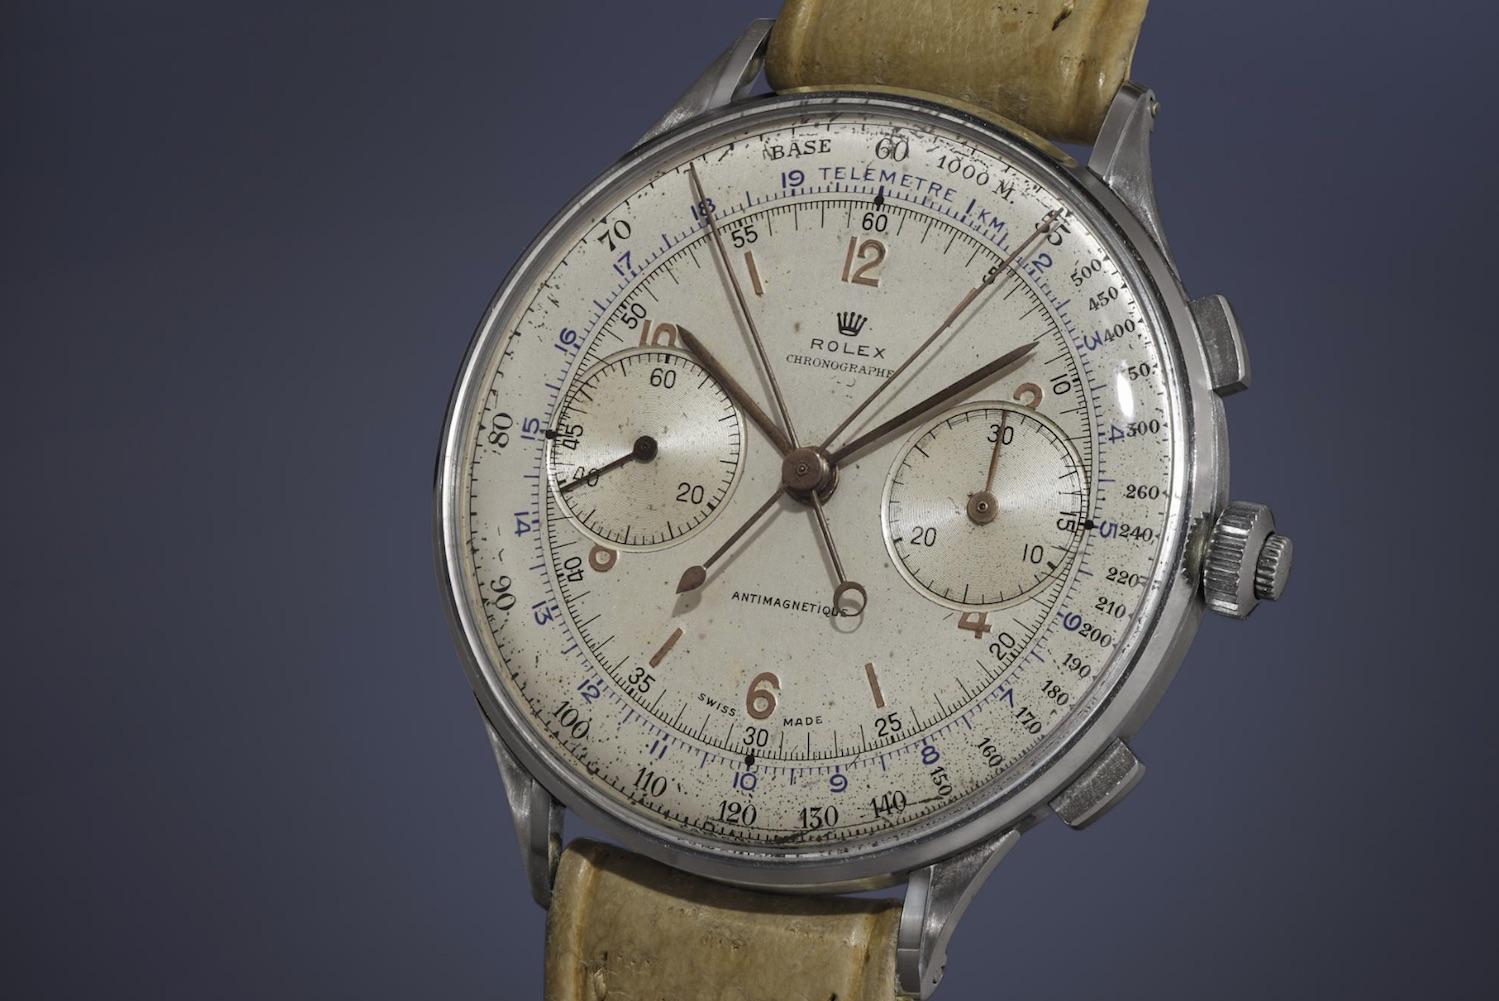 Rolex 4113 Rattrapante Chronograph - credit phillips